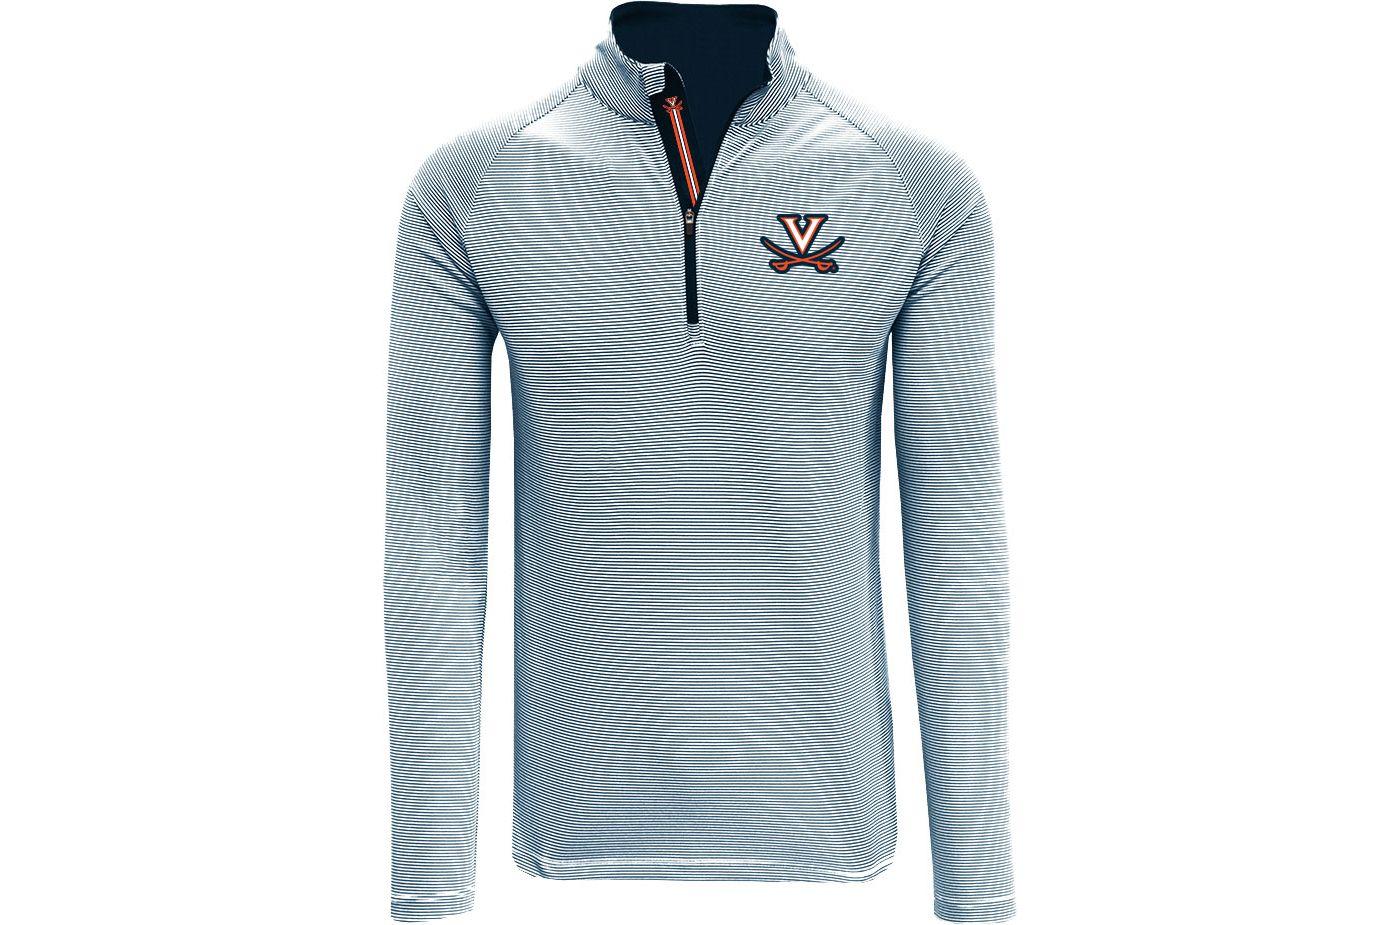 Levelwear Men's Virginia Cavaliers Blue Orion Quarter-Zip Shirt